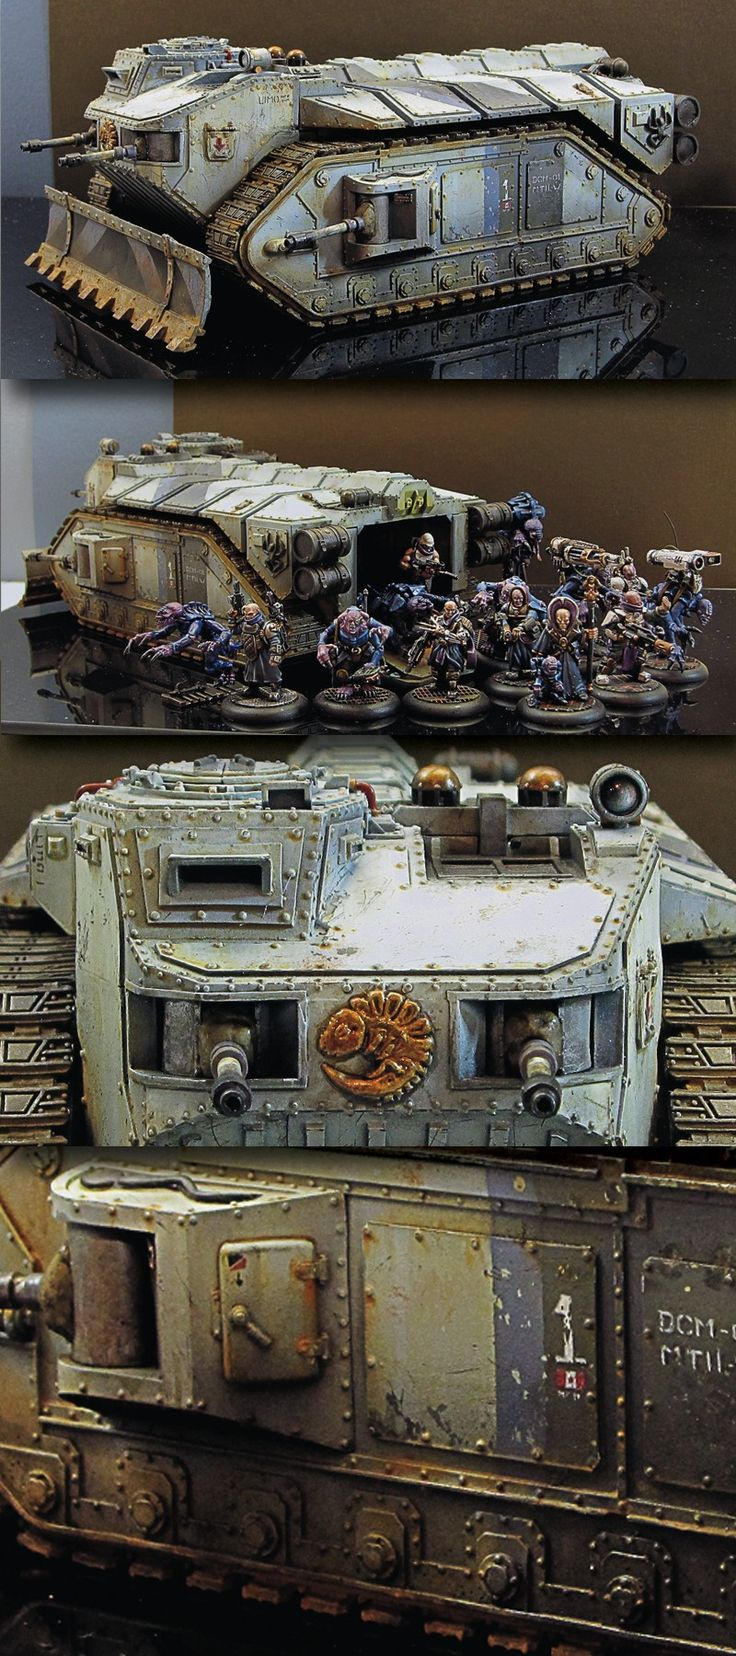 CoolMiniOrNot - Crassus Assault Tranport/ Genestealer Limo by MajorTom11